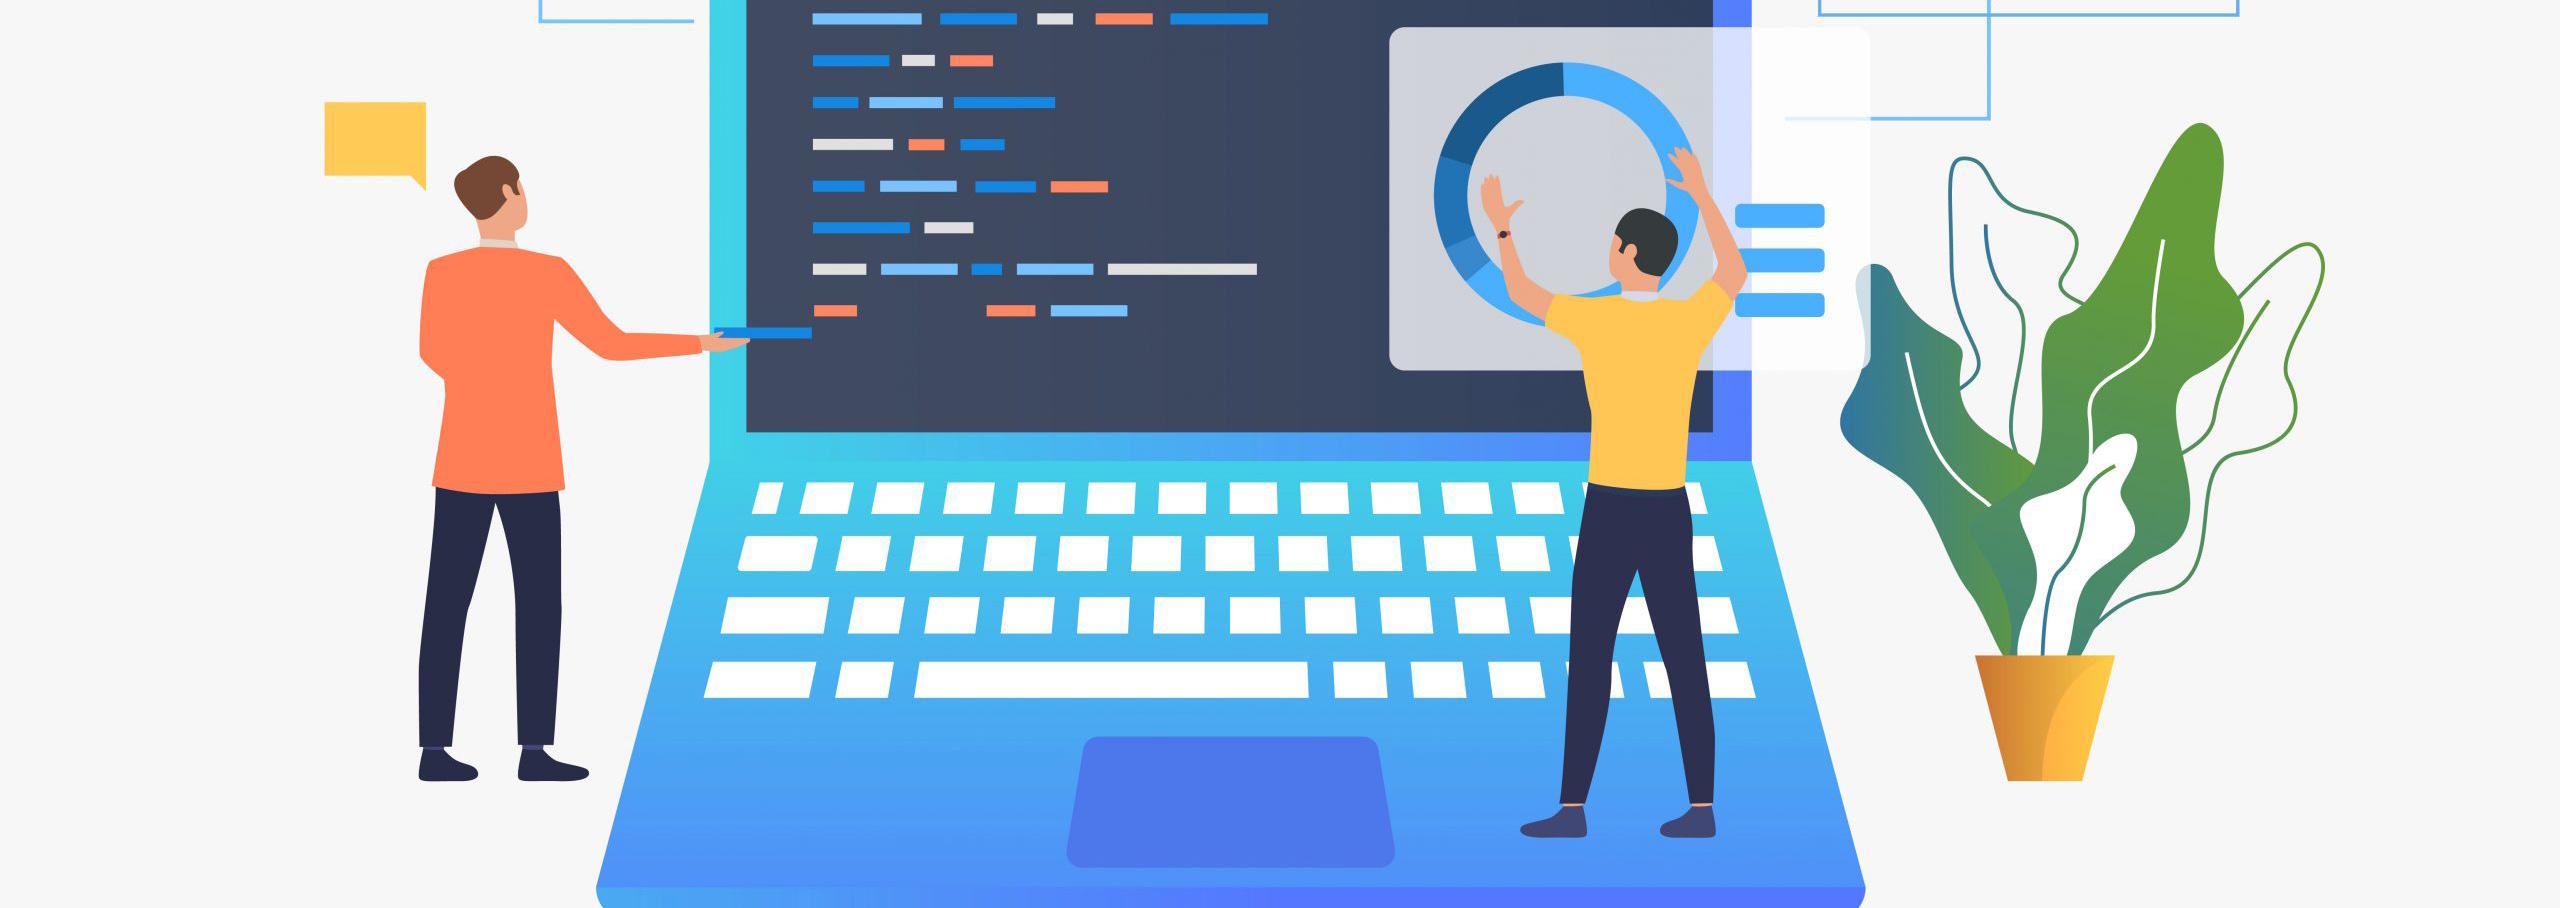 Software License Management: Best Practices - OpenLM Software License  Management